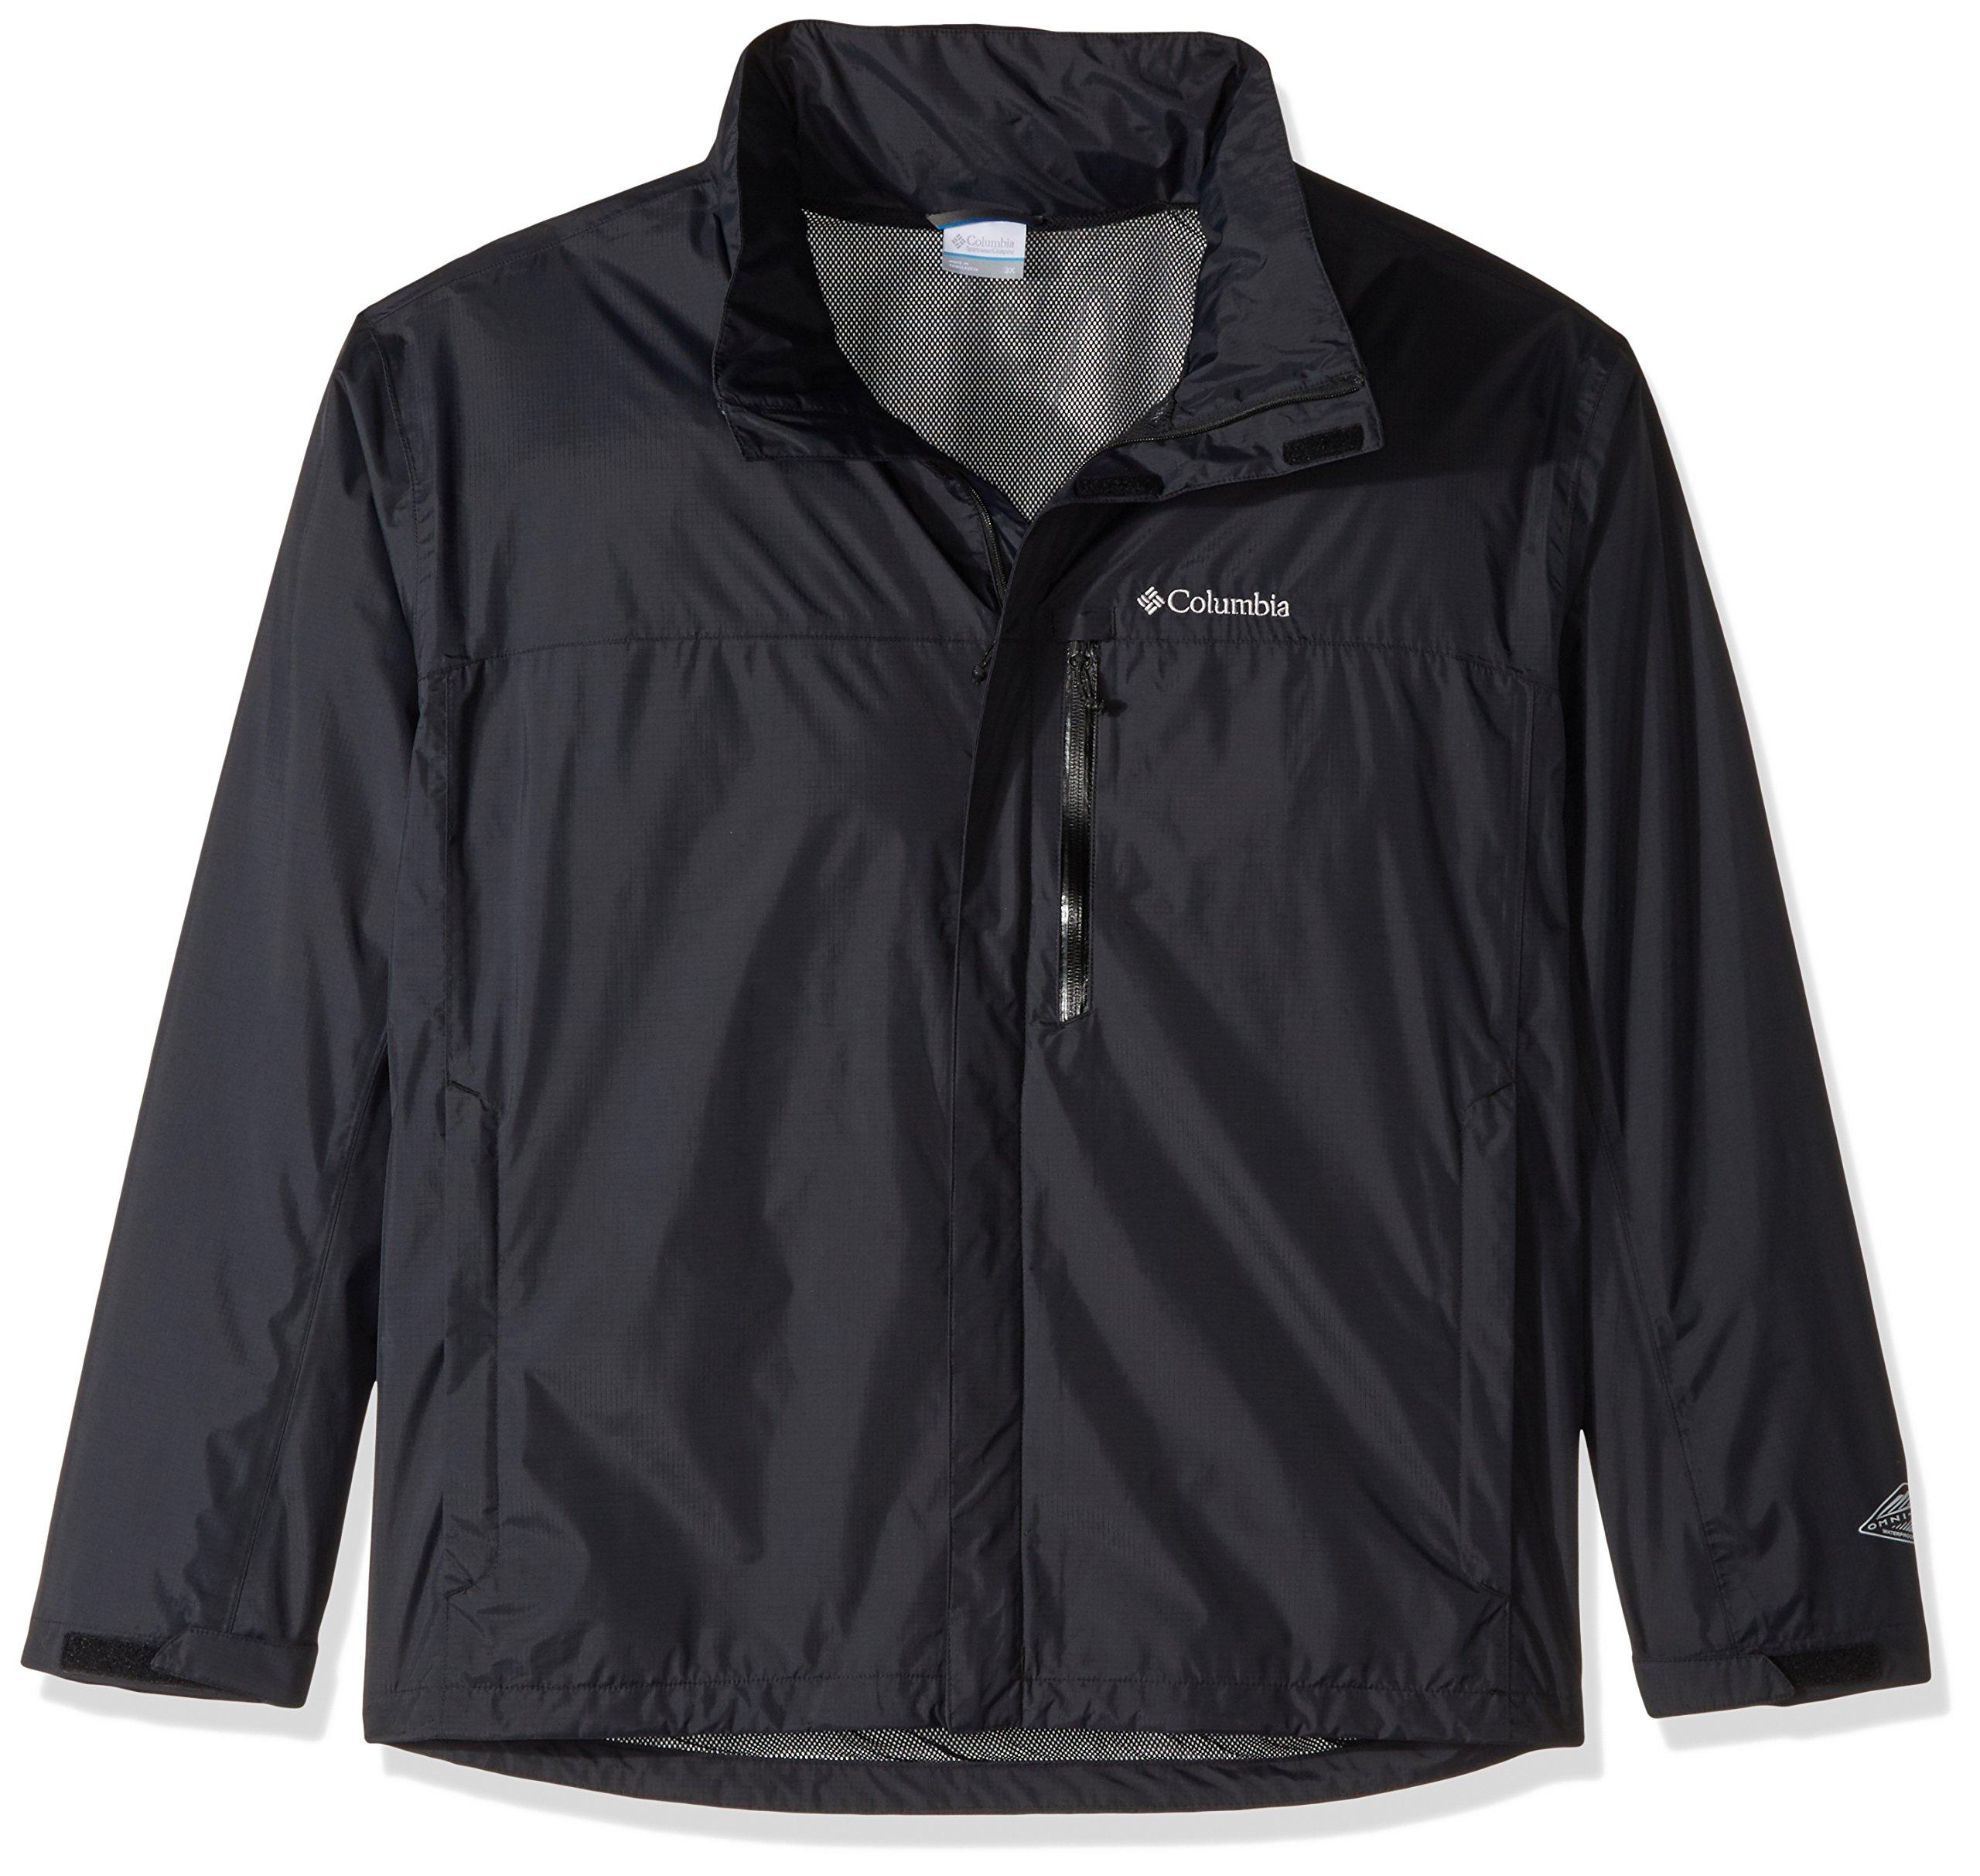 Columbia Men's Pouration Waterproof Rain Jacket, X-Large/Tall, Black